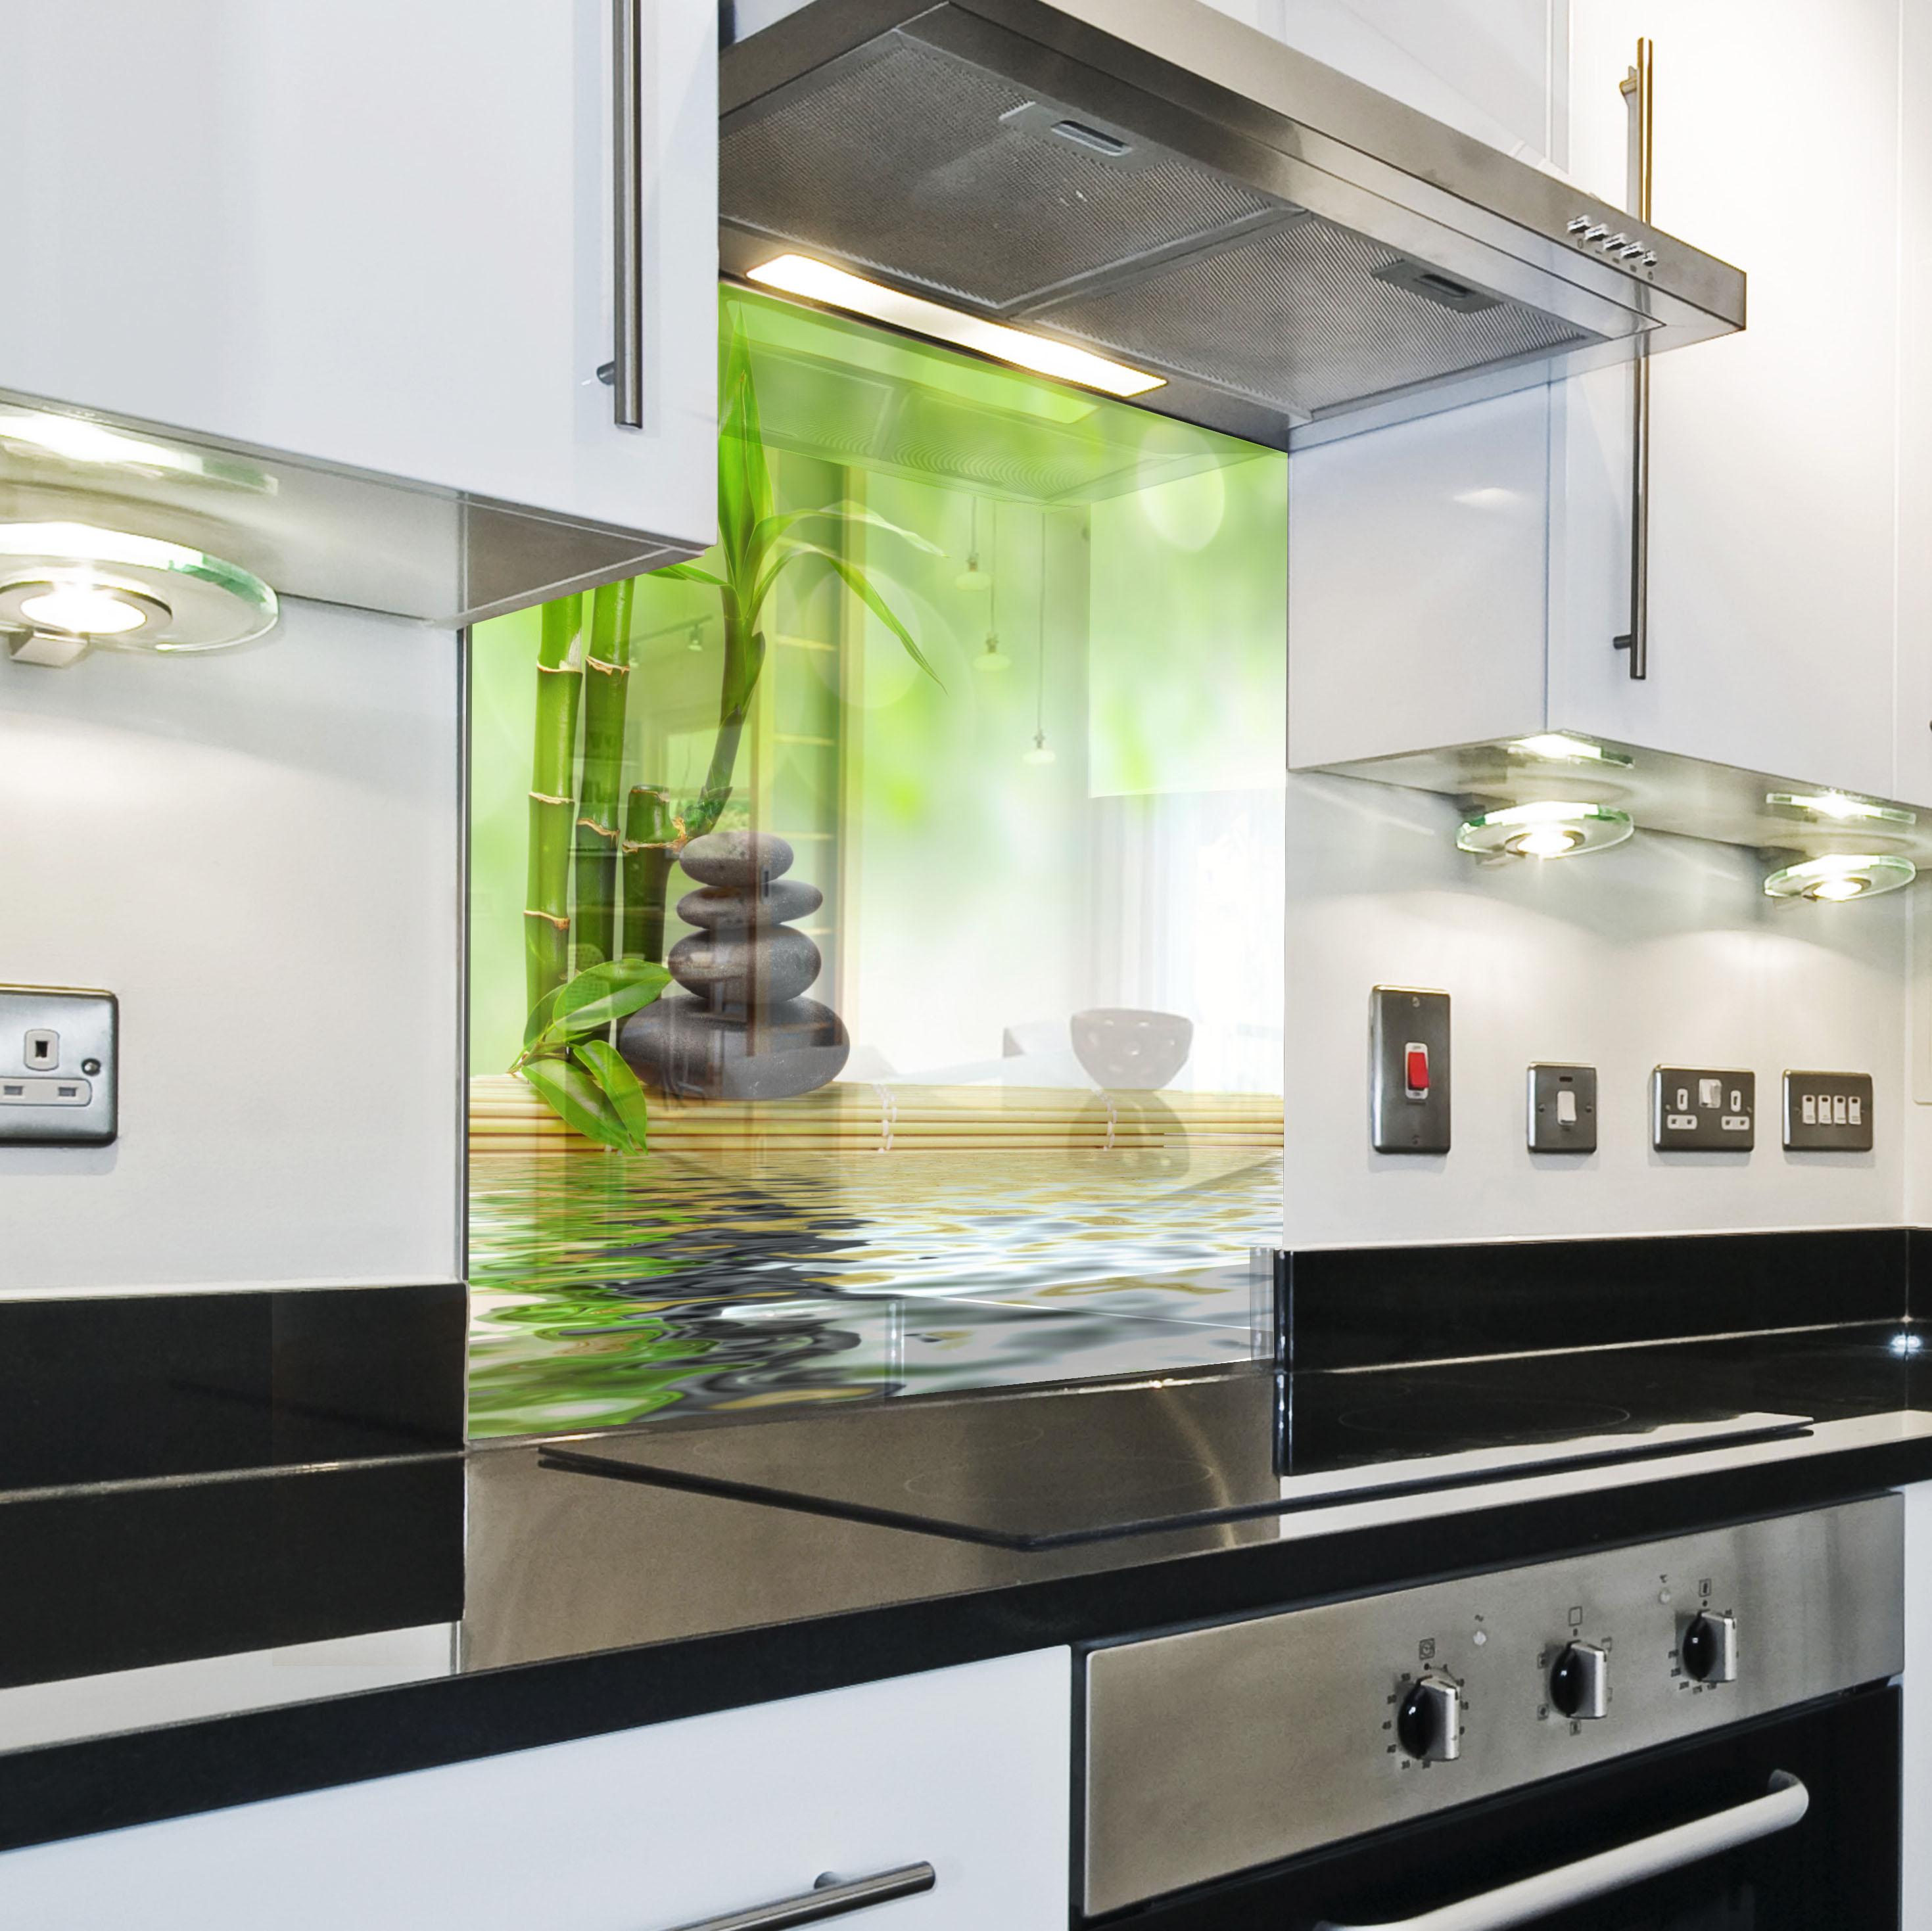 Splashback paraschizzi paraspruzzi rivestimento cucina foglia natura verde ebay - Pannello cucina rivestimento ...